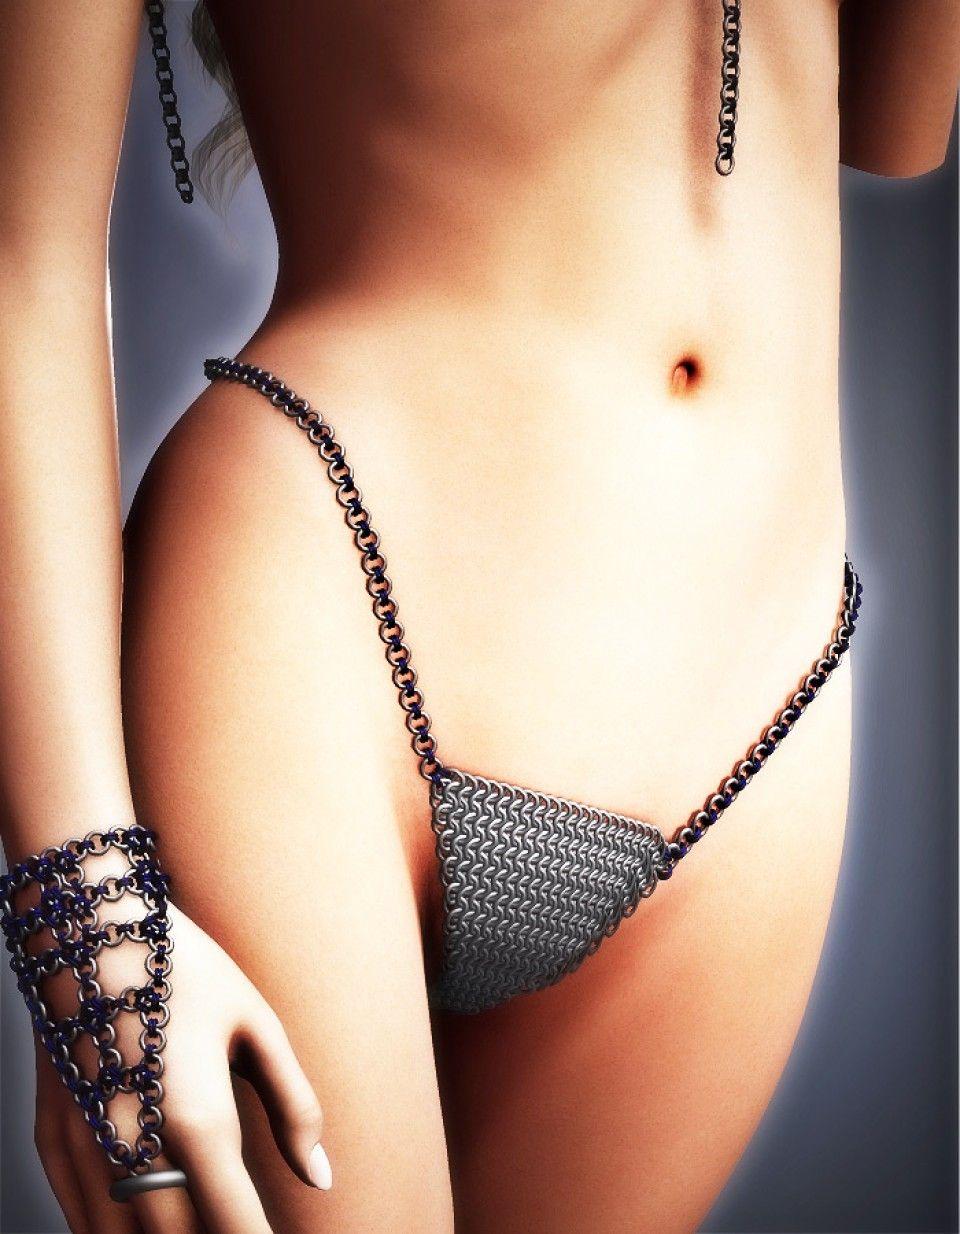 879b68f314d82 Chainmail Bikini Bottom V4 | Daz3D Clothing 1 in 2019 | Bikinis ...